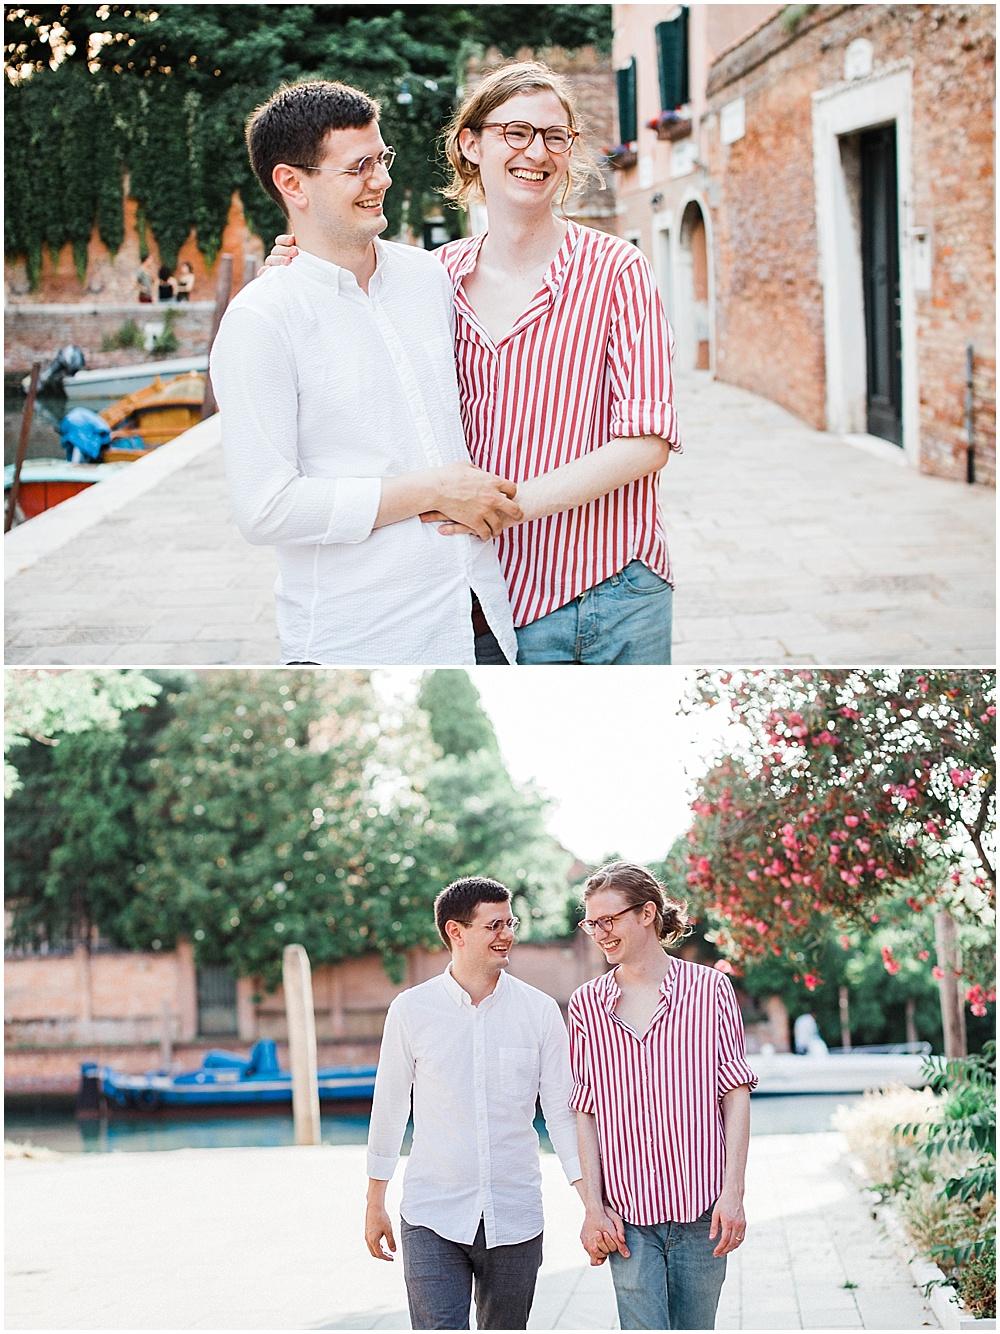 same-sex-wedding-photographer-venice-stefano-degirmenci_0001.jpg